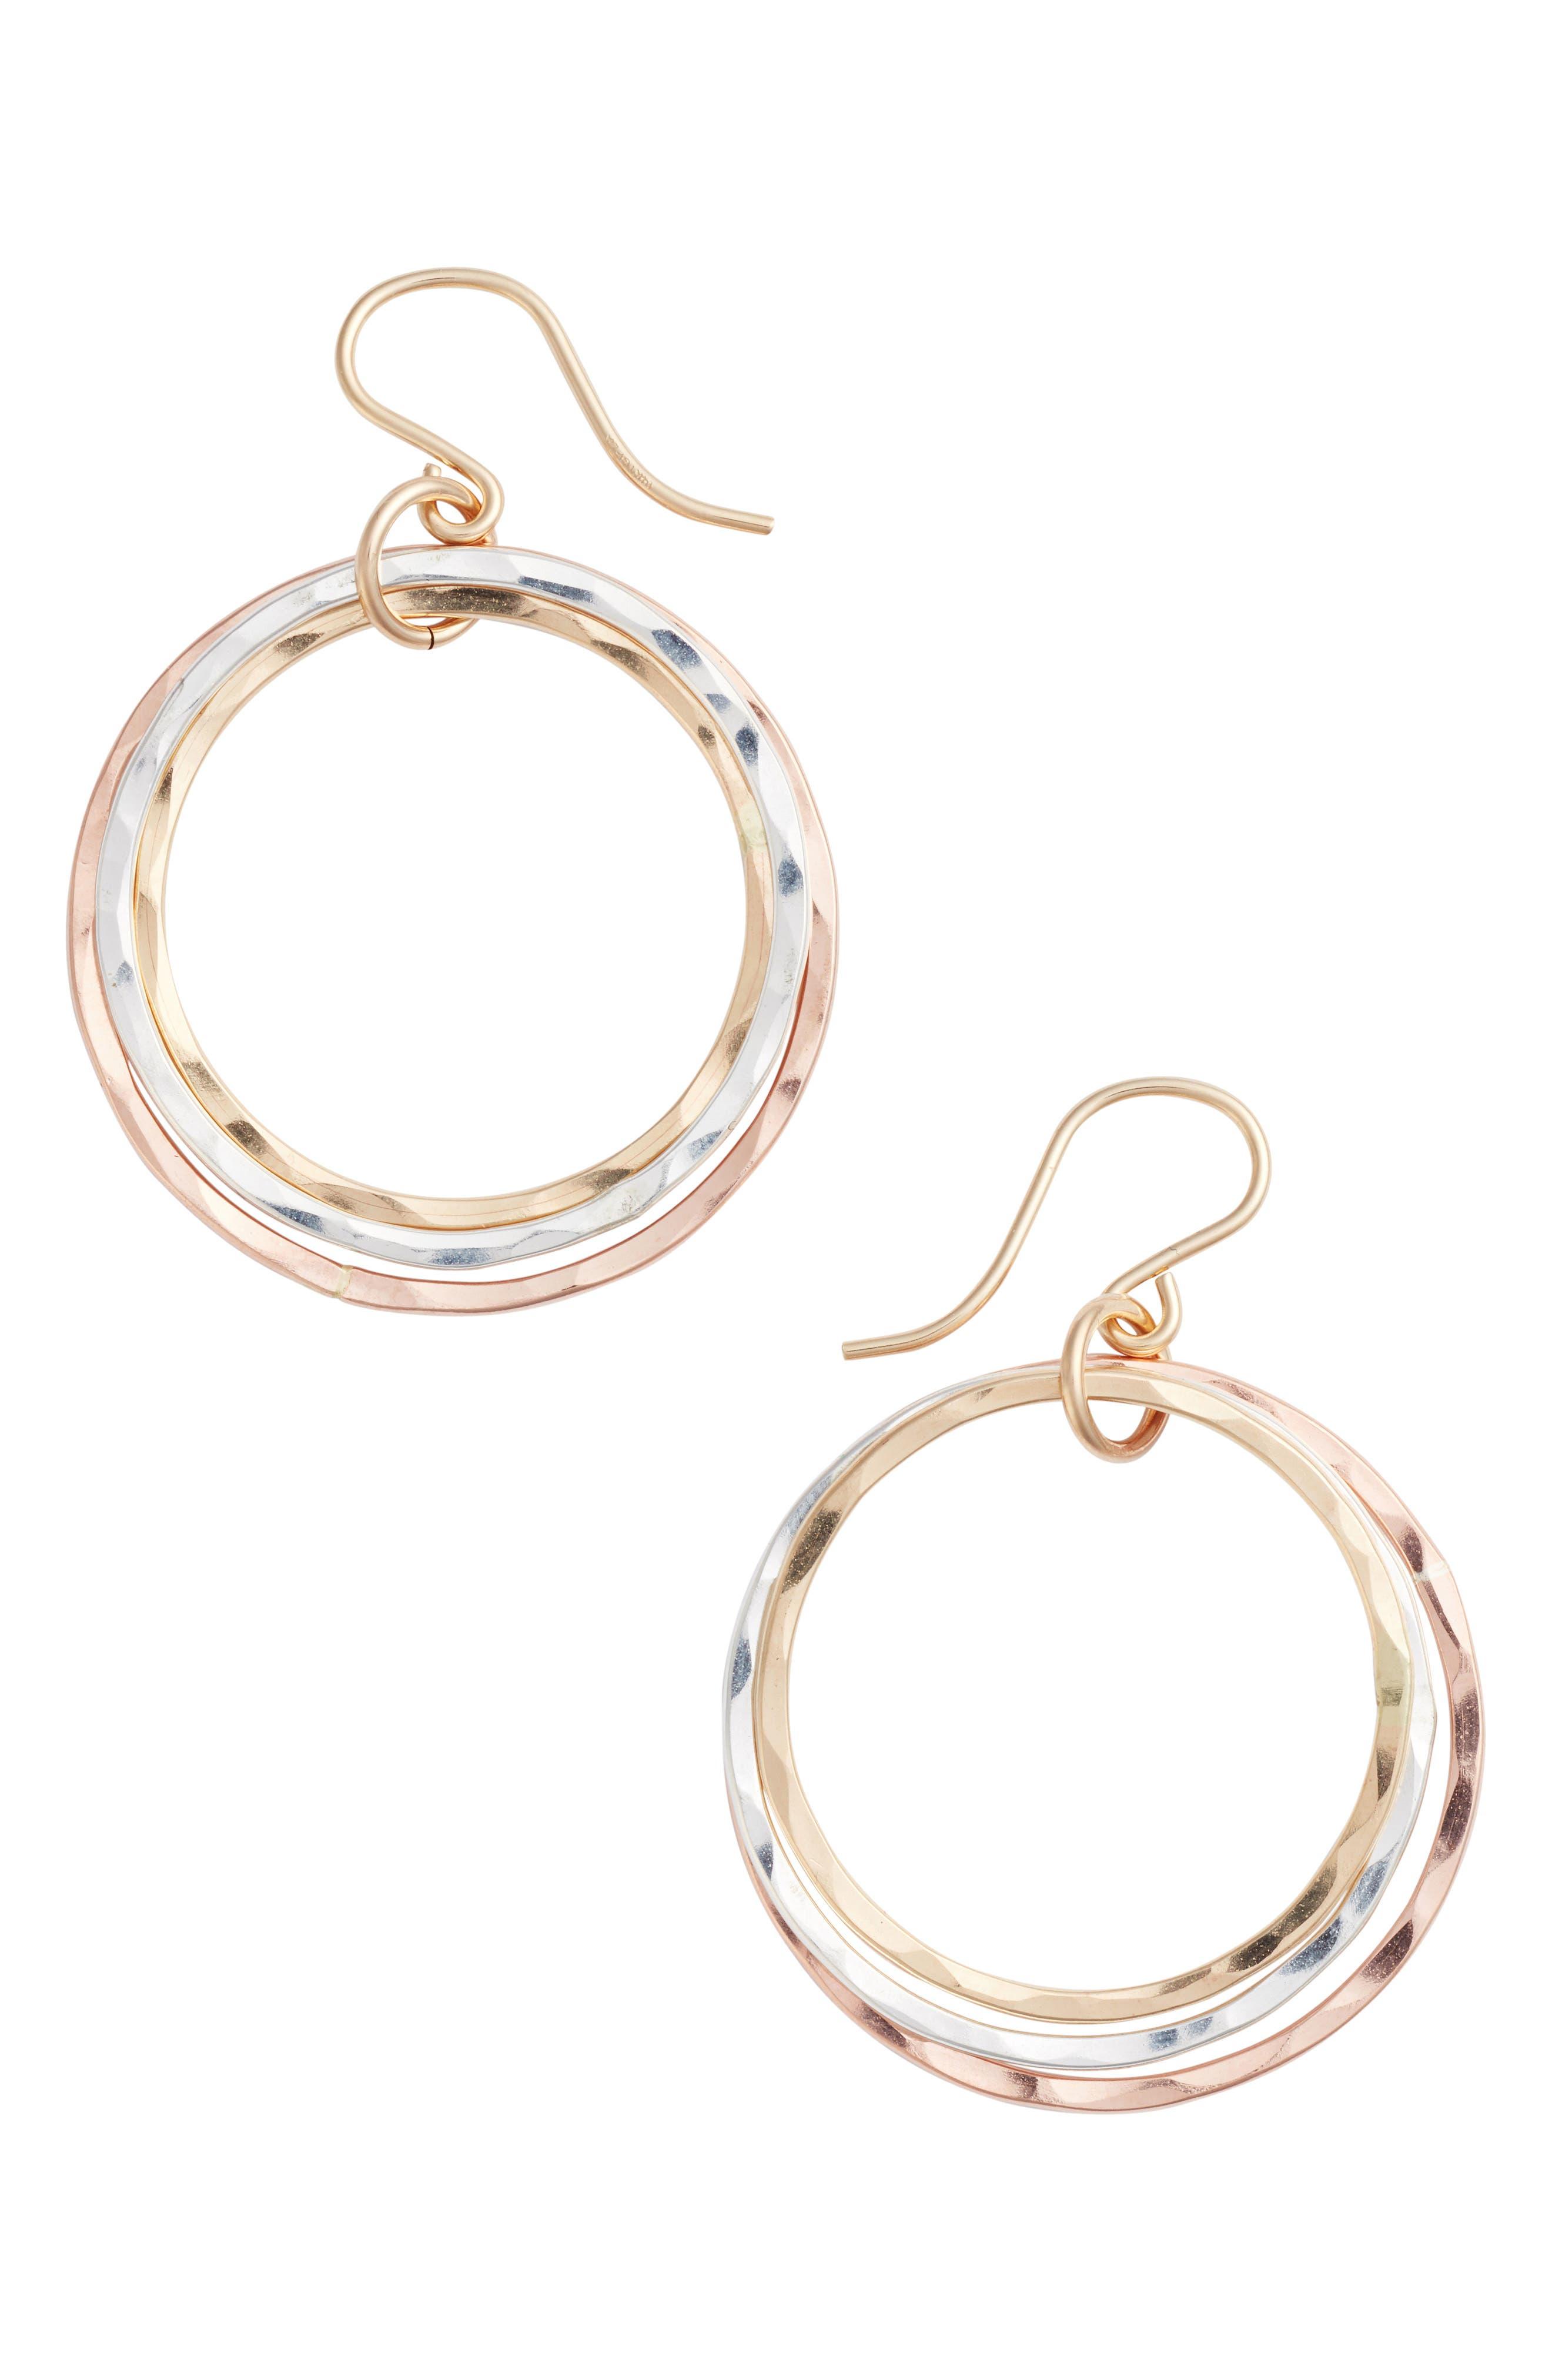 Main Image - Nashelle Wellness Small Hoop Earrings